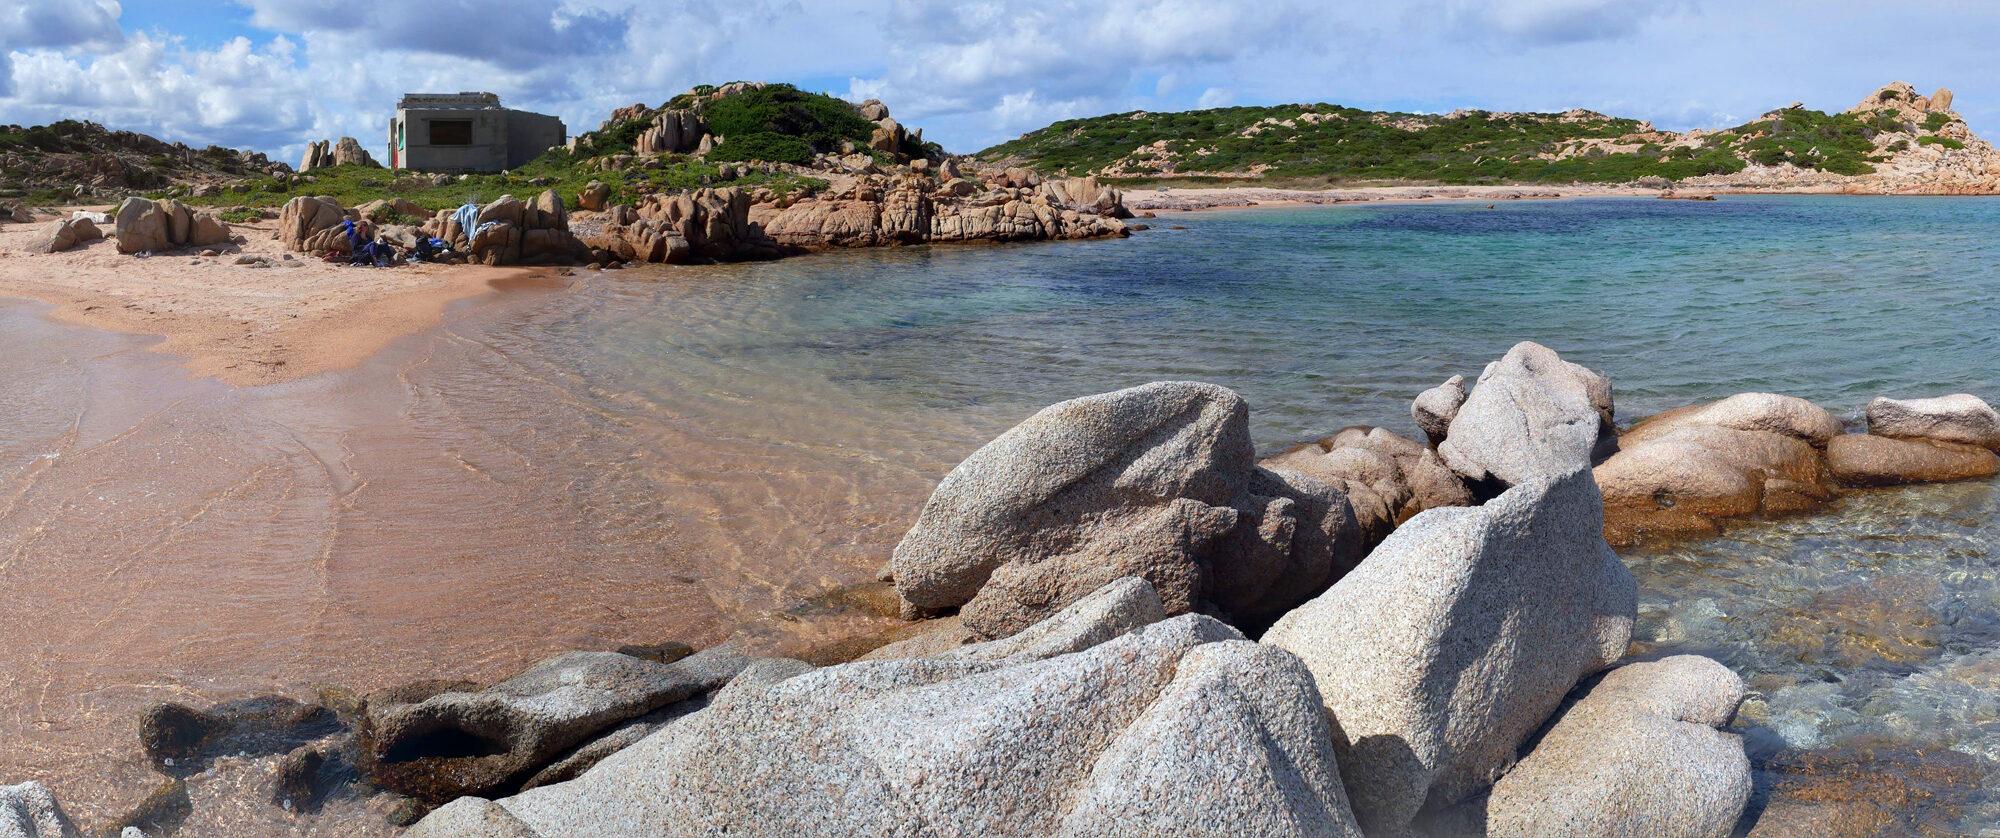 Blick auf den Spiaggia Strangolato